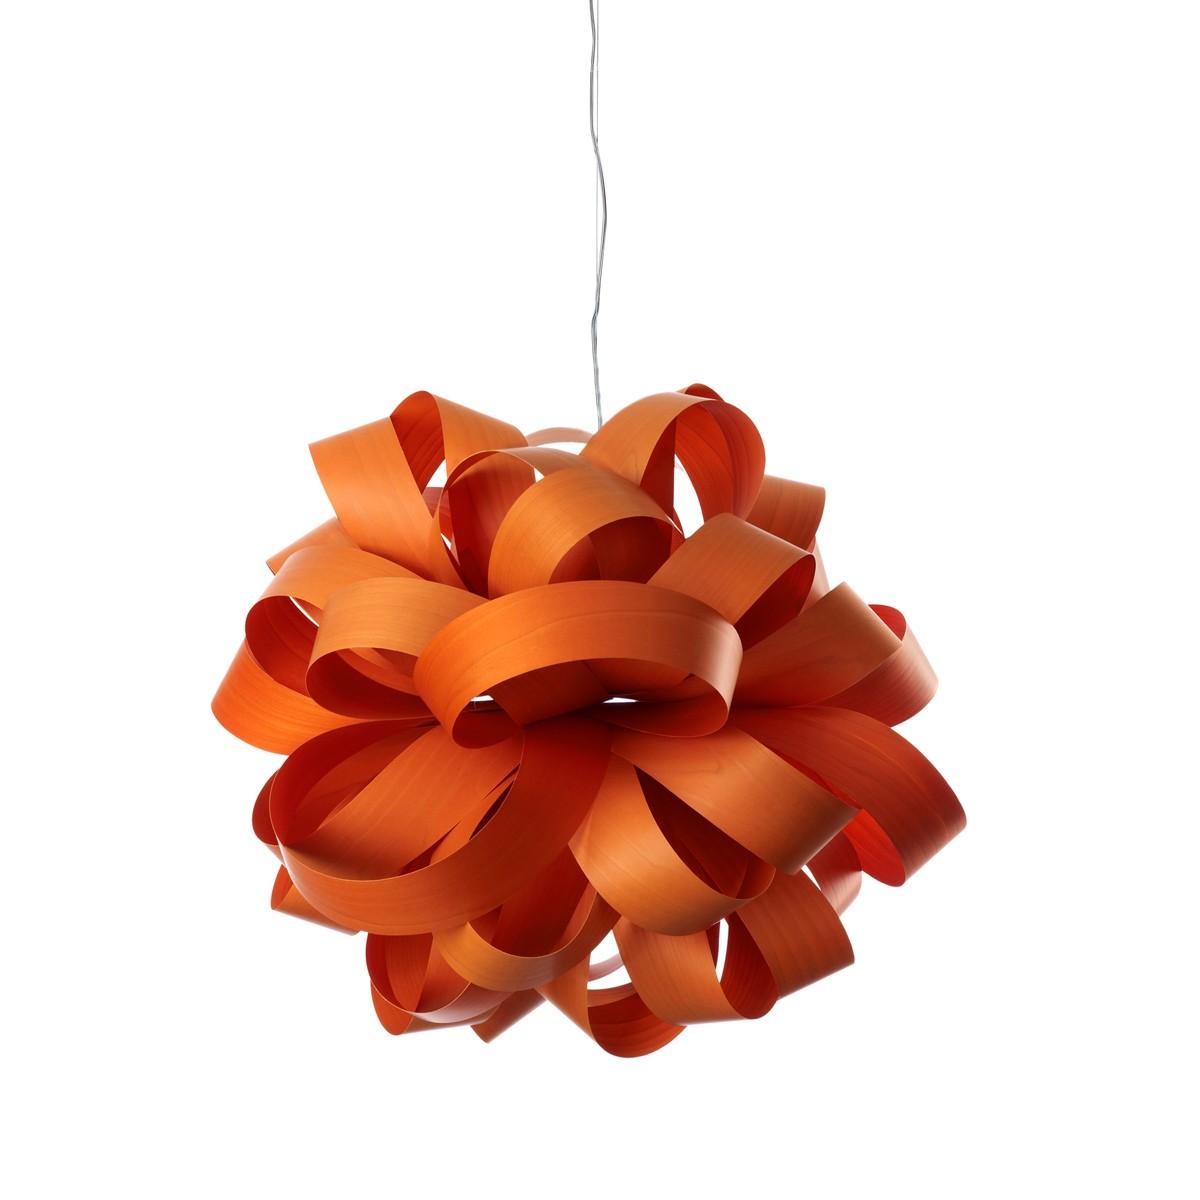 LZF Lamps Agatha Ball Pendelleuchte, orange